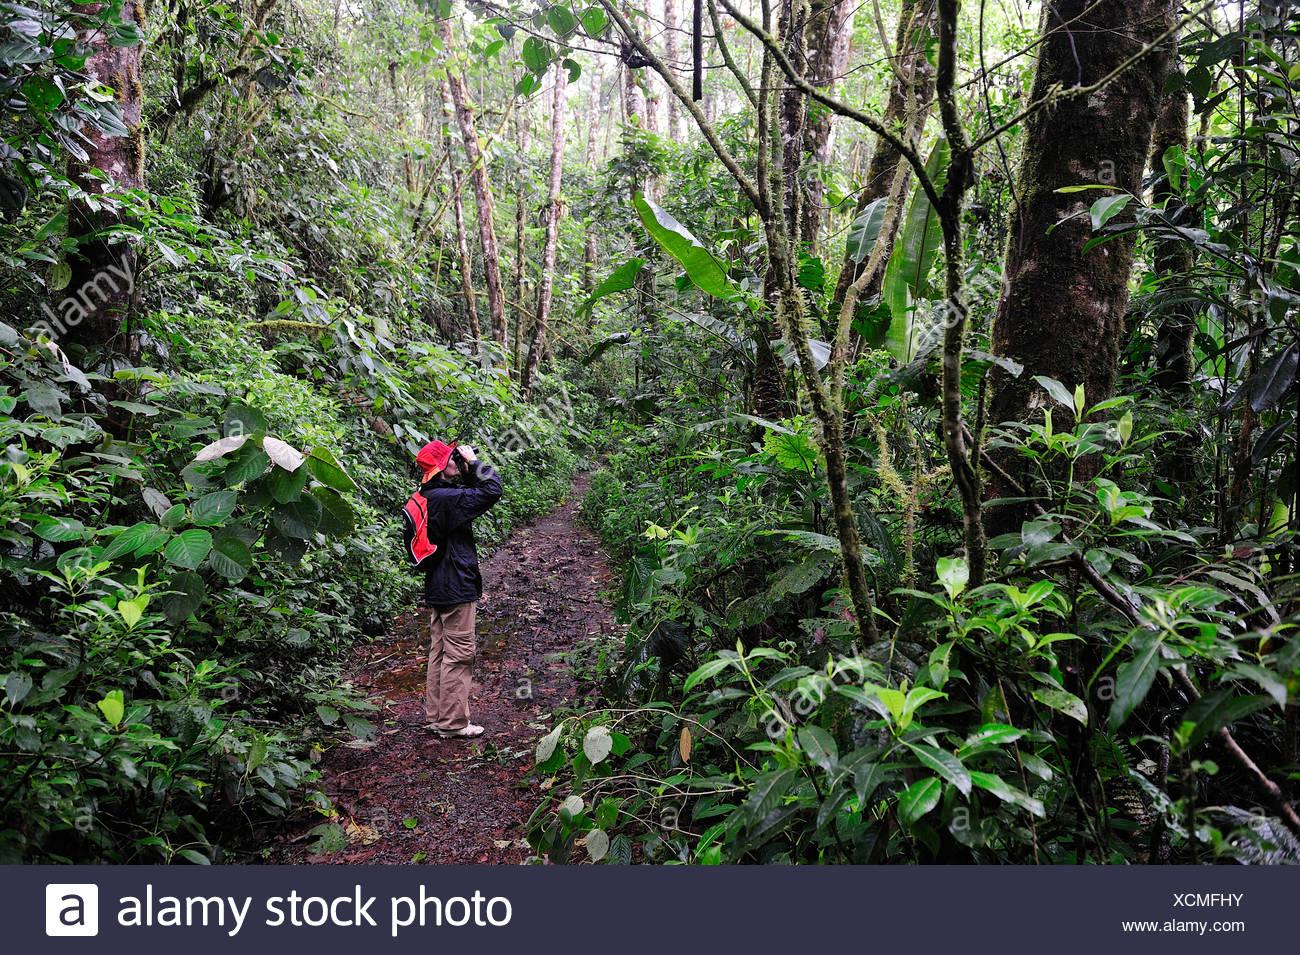 Frau fernglas tropical regenwald nebelwald regenwald person